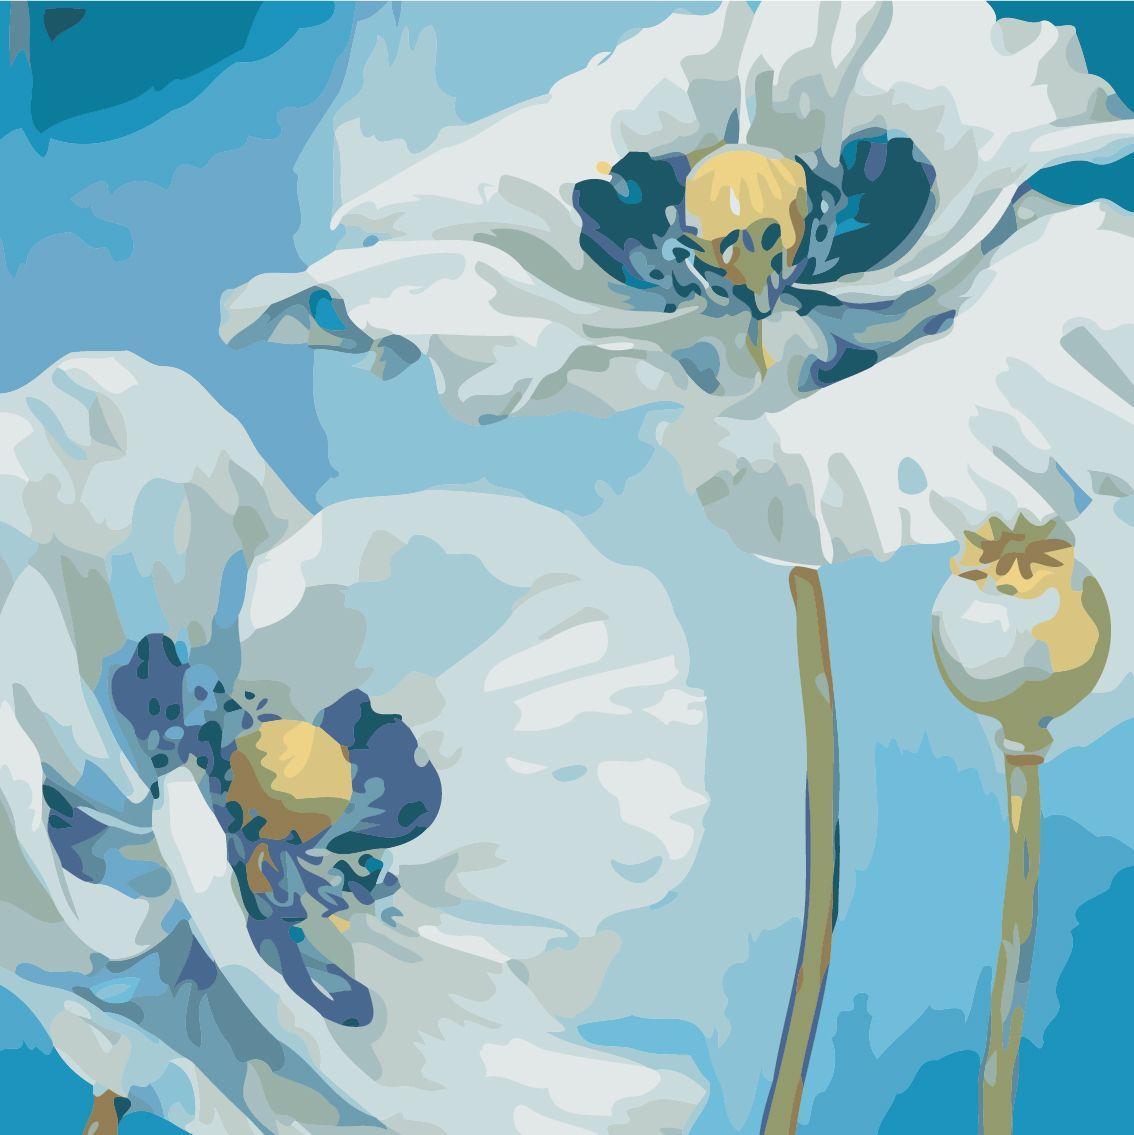 AS0504 Набор живописи по номерам Белые цветы, Без коробки